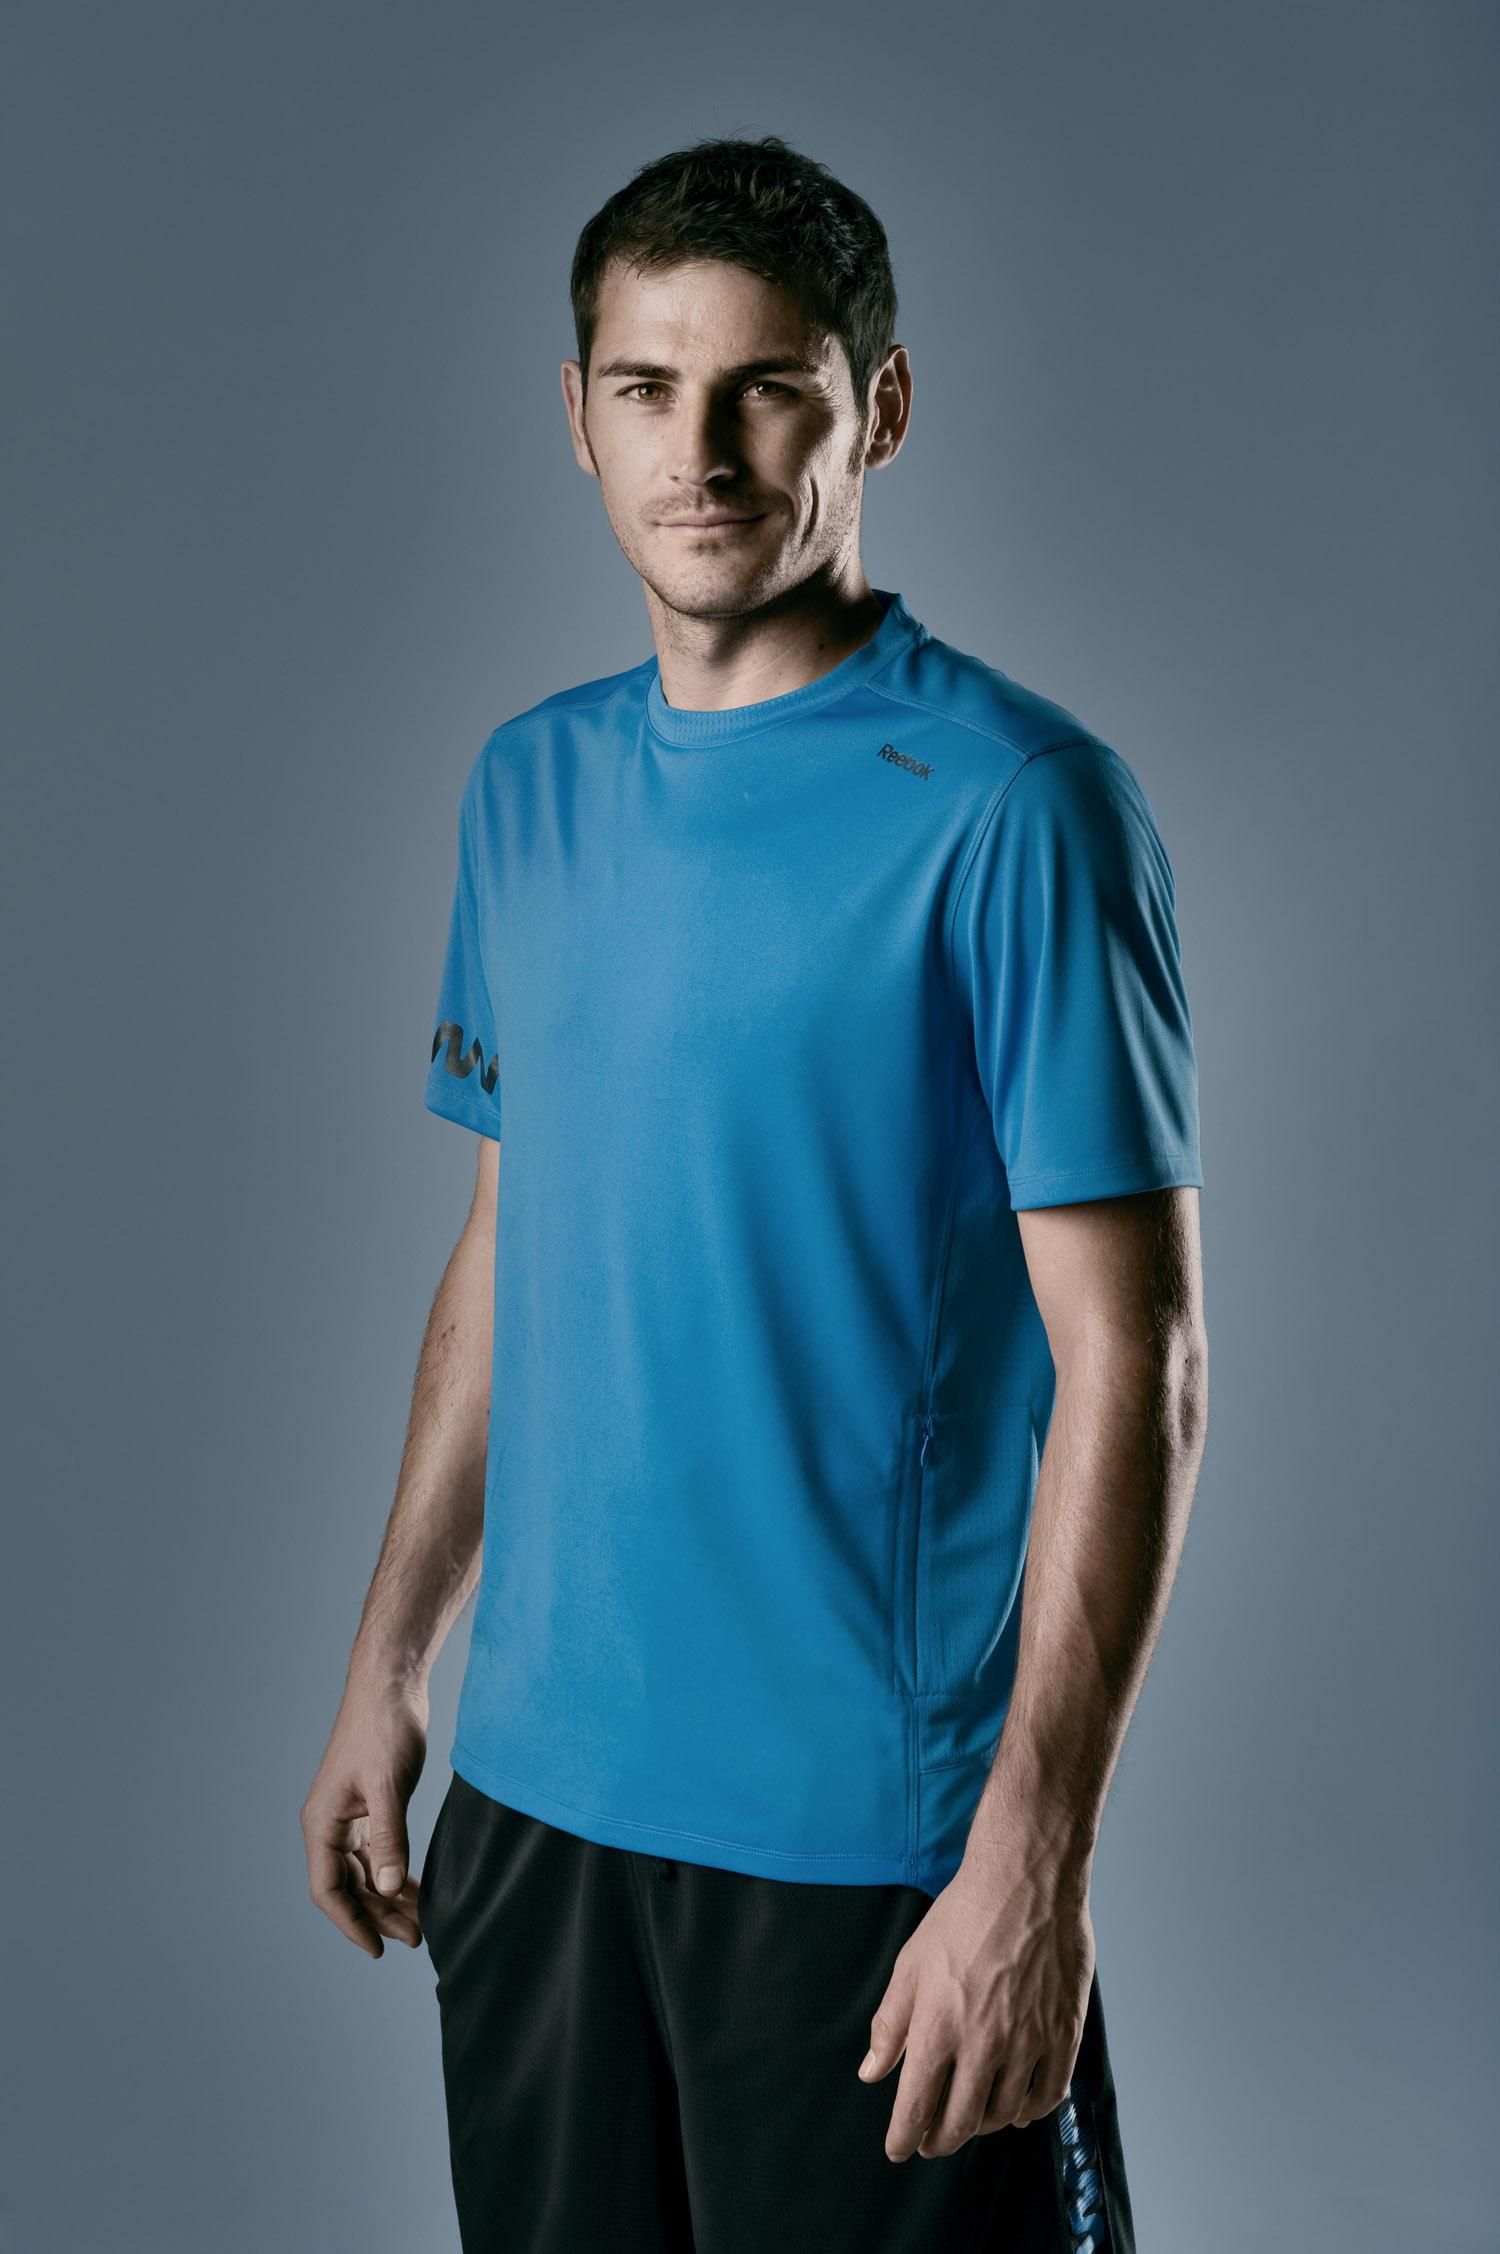 Iker Casillas photo 19 of 80 pics, wallpaper - photo #449225 ... Matt Damon